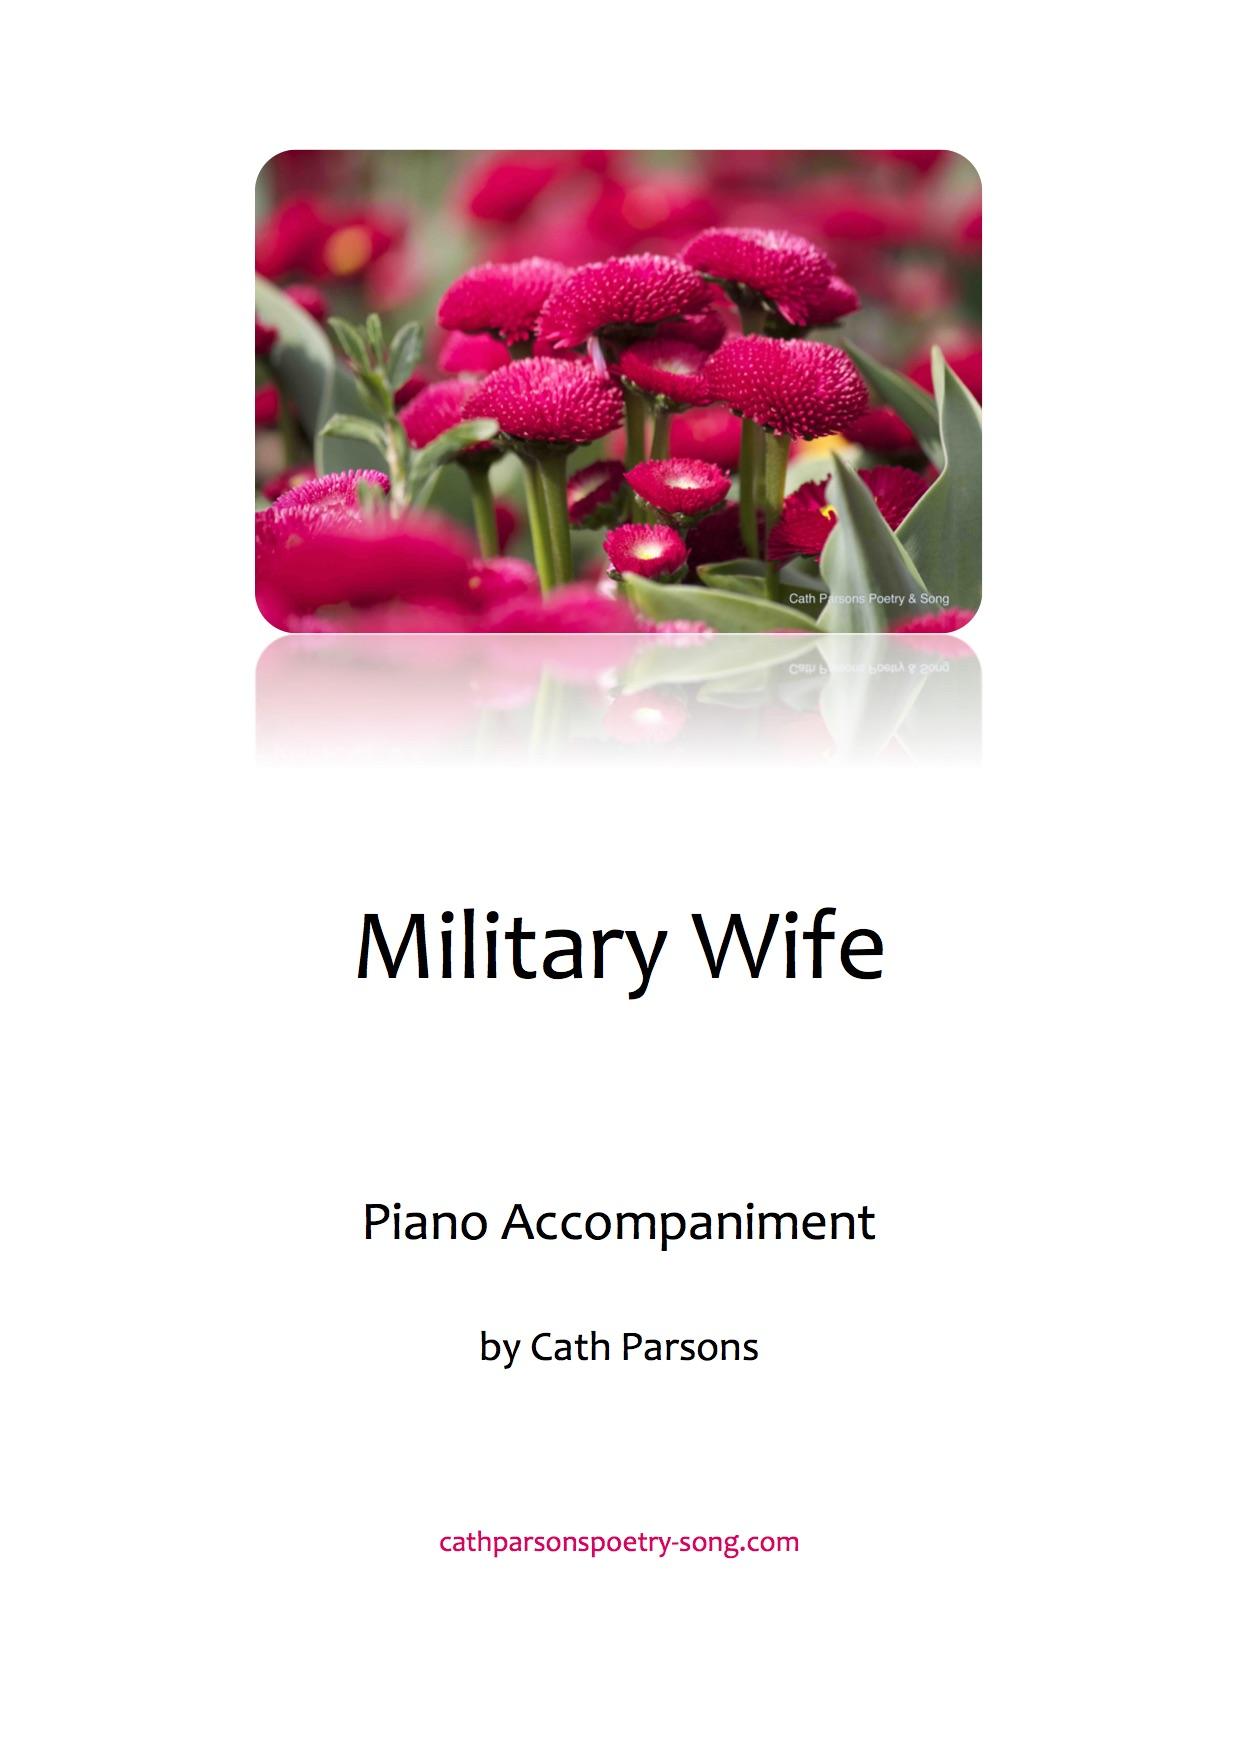 Military Wife Instrumental - FREE DOWNLOAD - Sylvia Wang